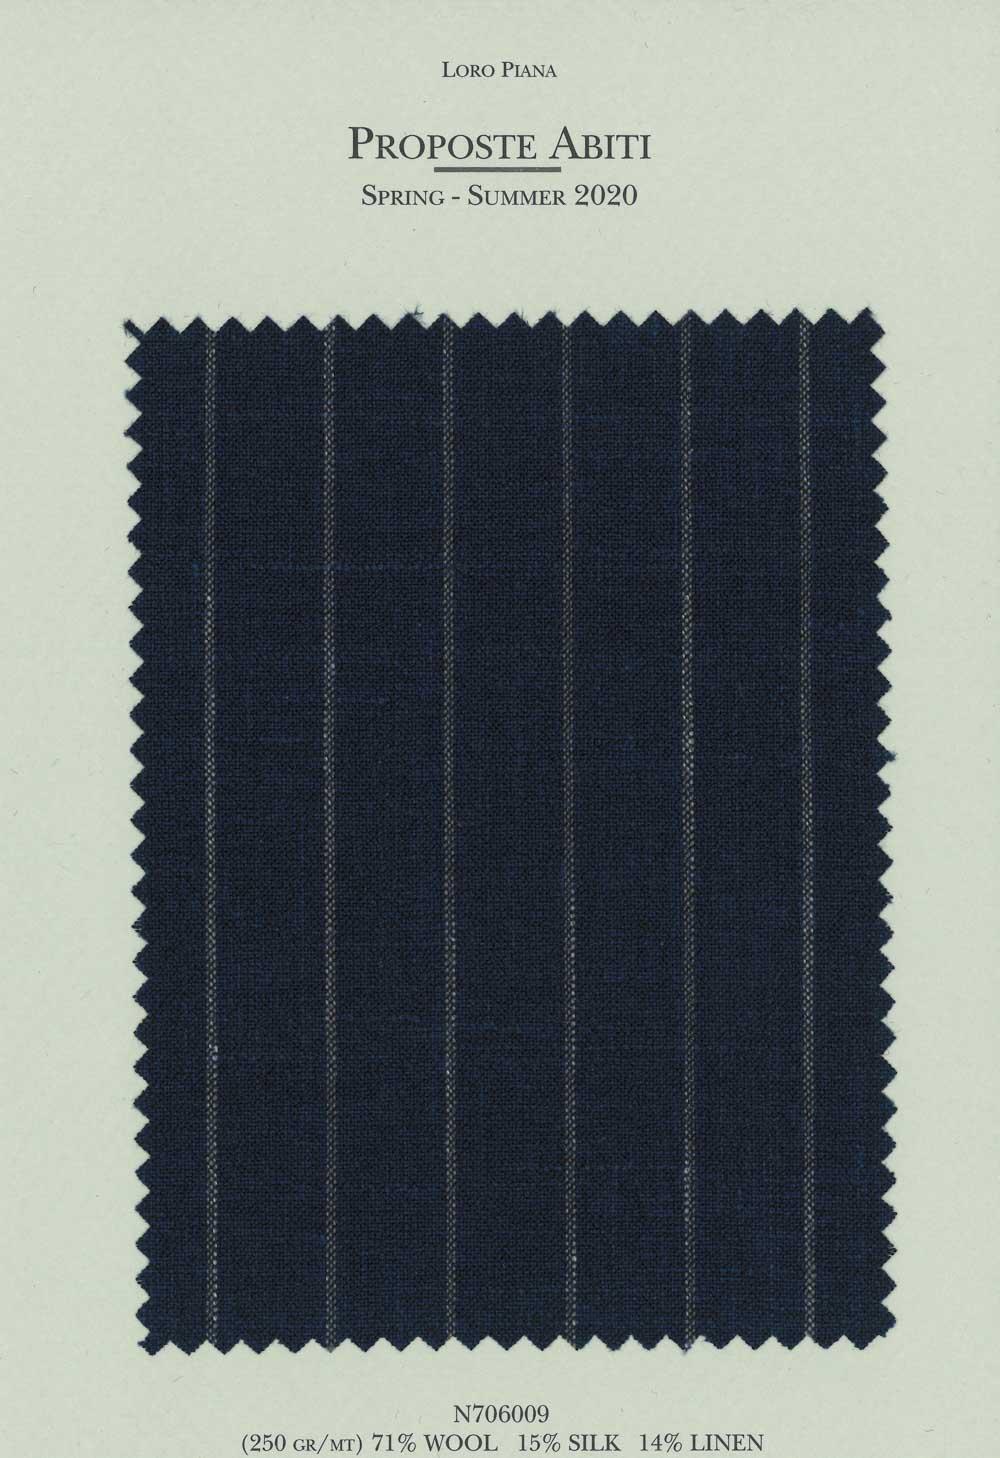 Lpn706009